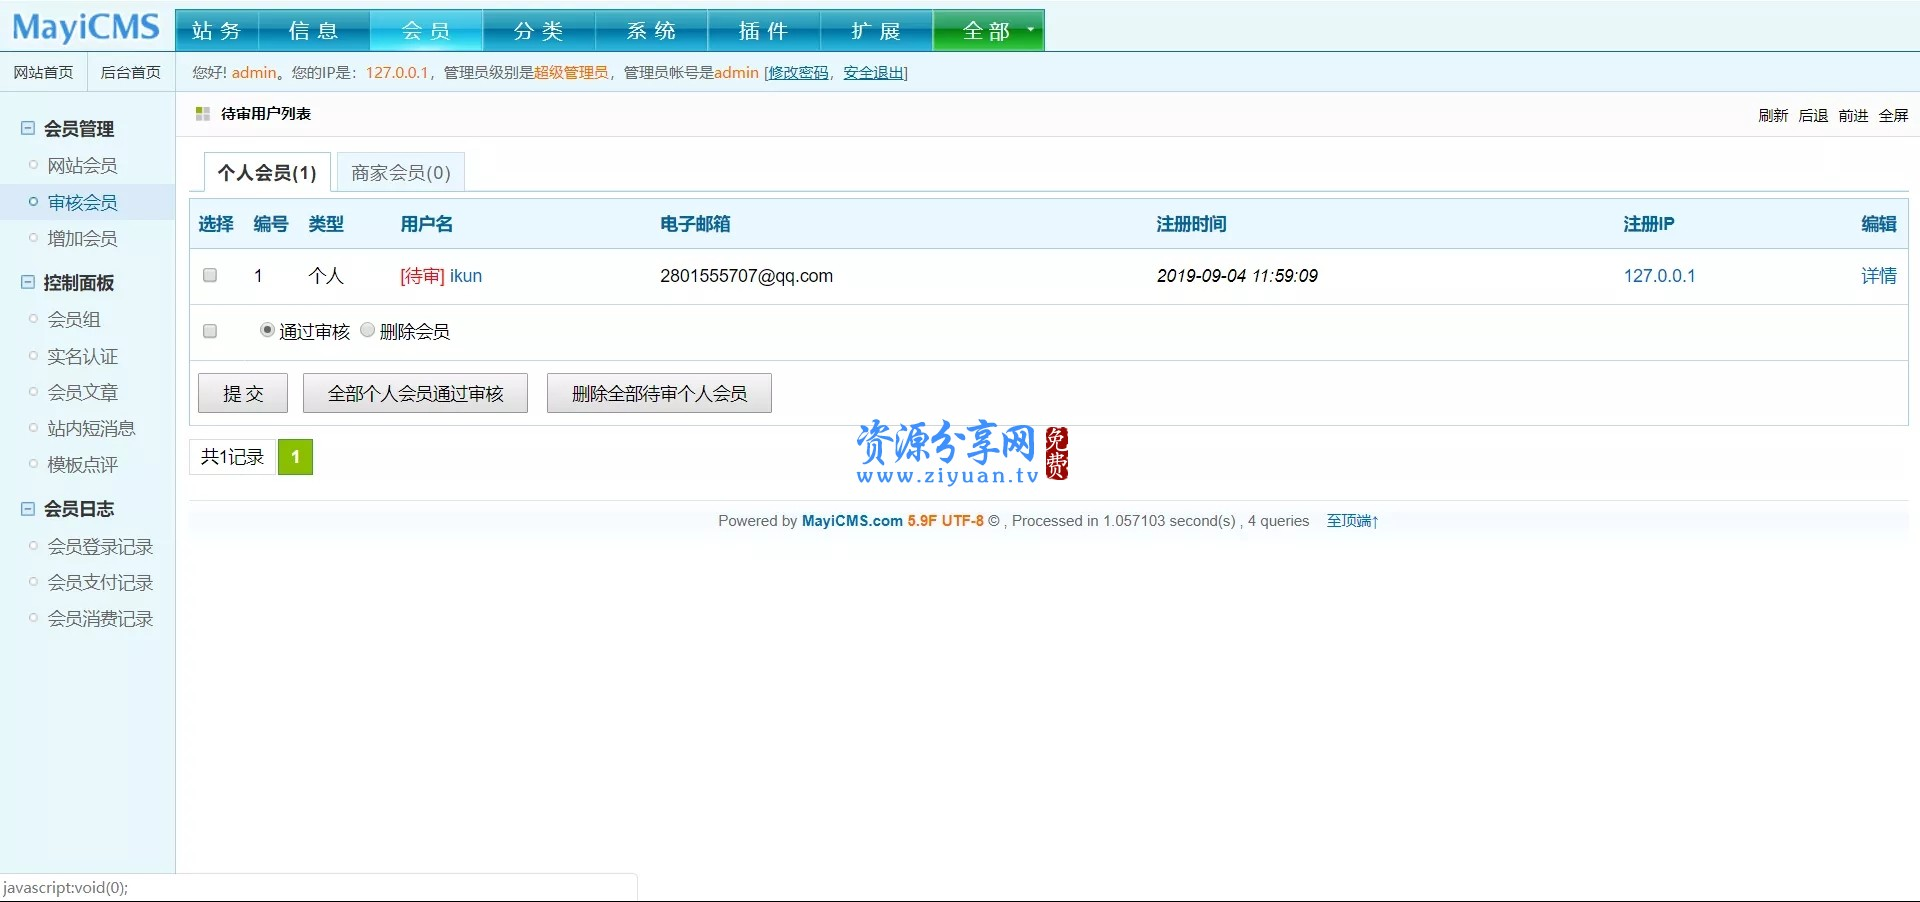 MayiCMS 分类信息系统优化版 v5.9